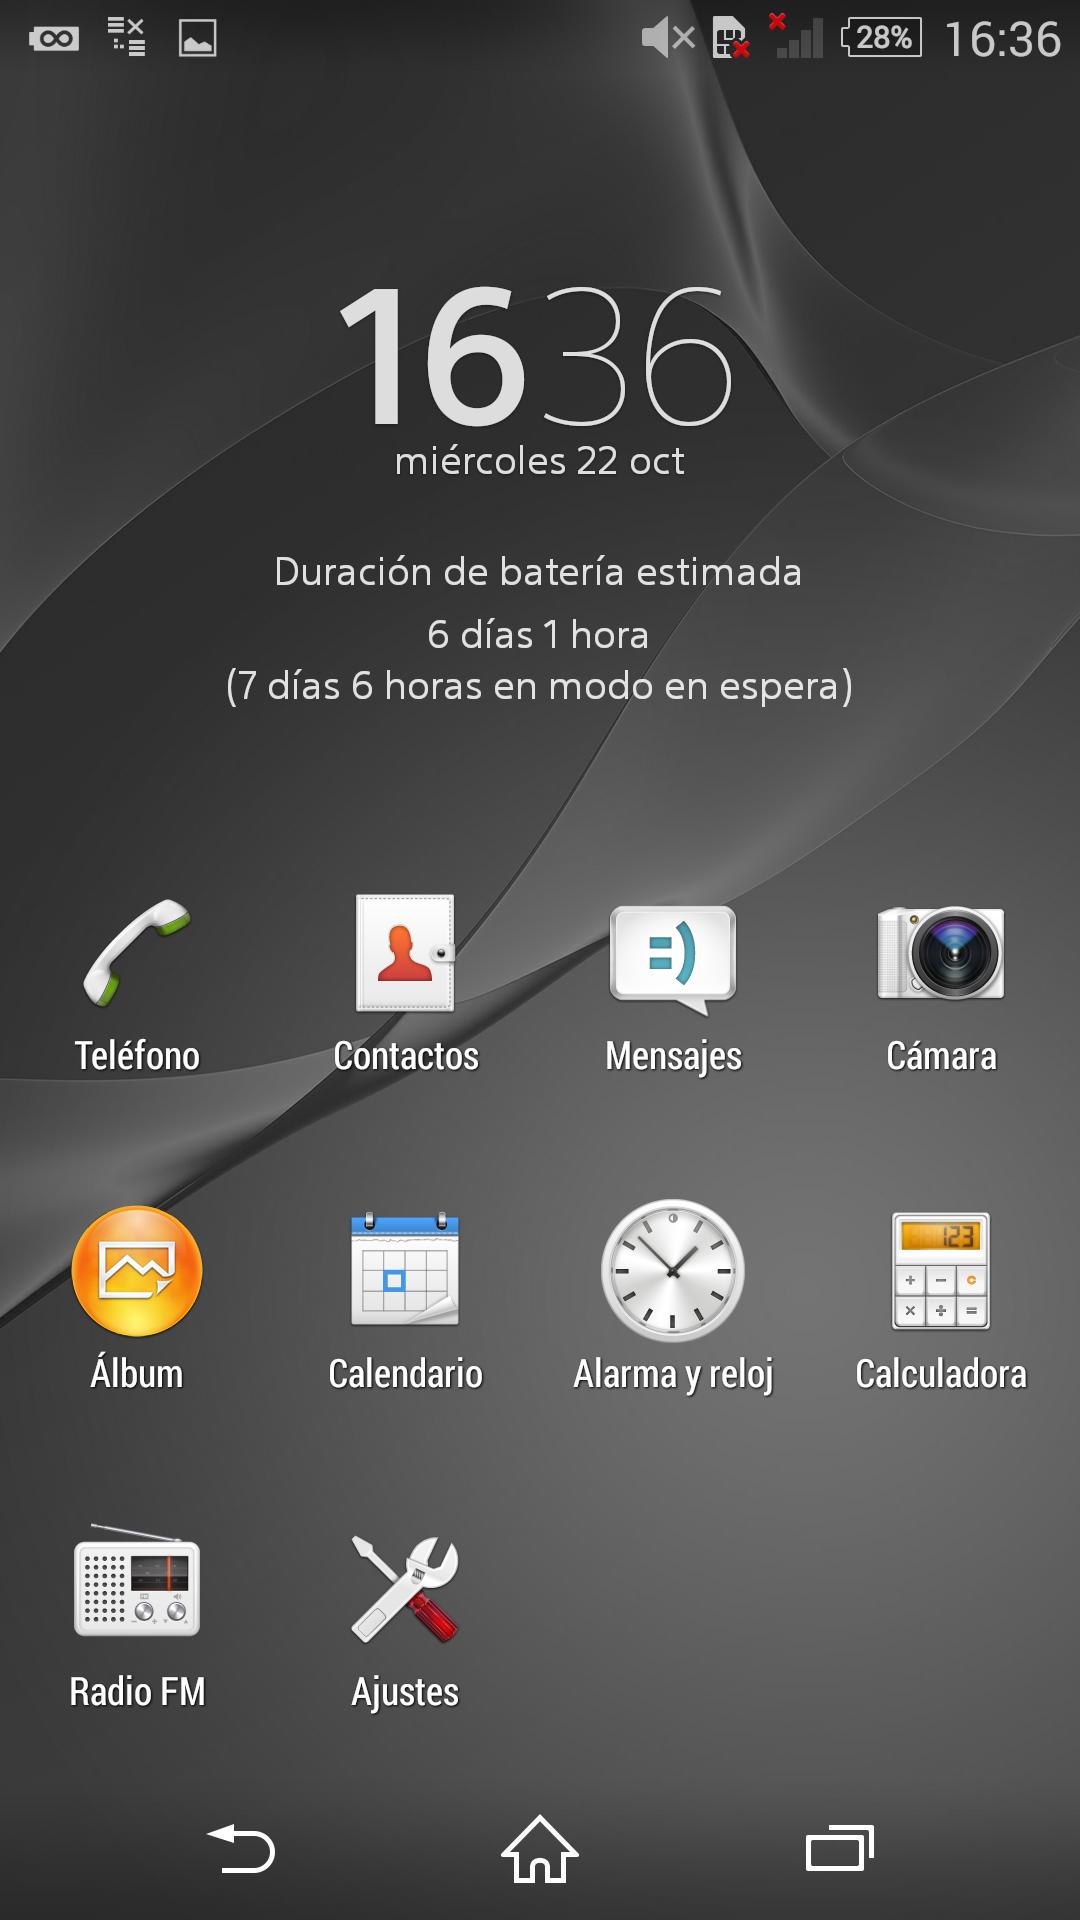 Screenshot_2014-10-22-16-36-44.png